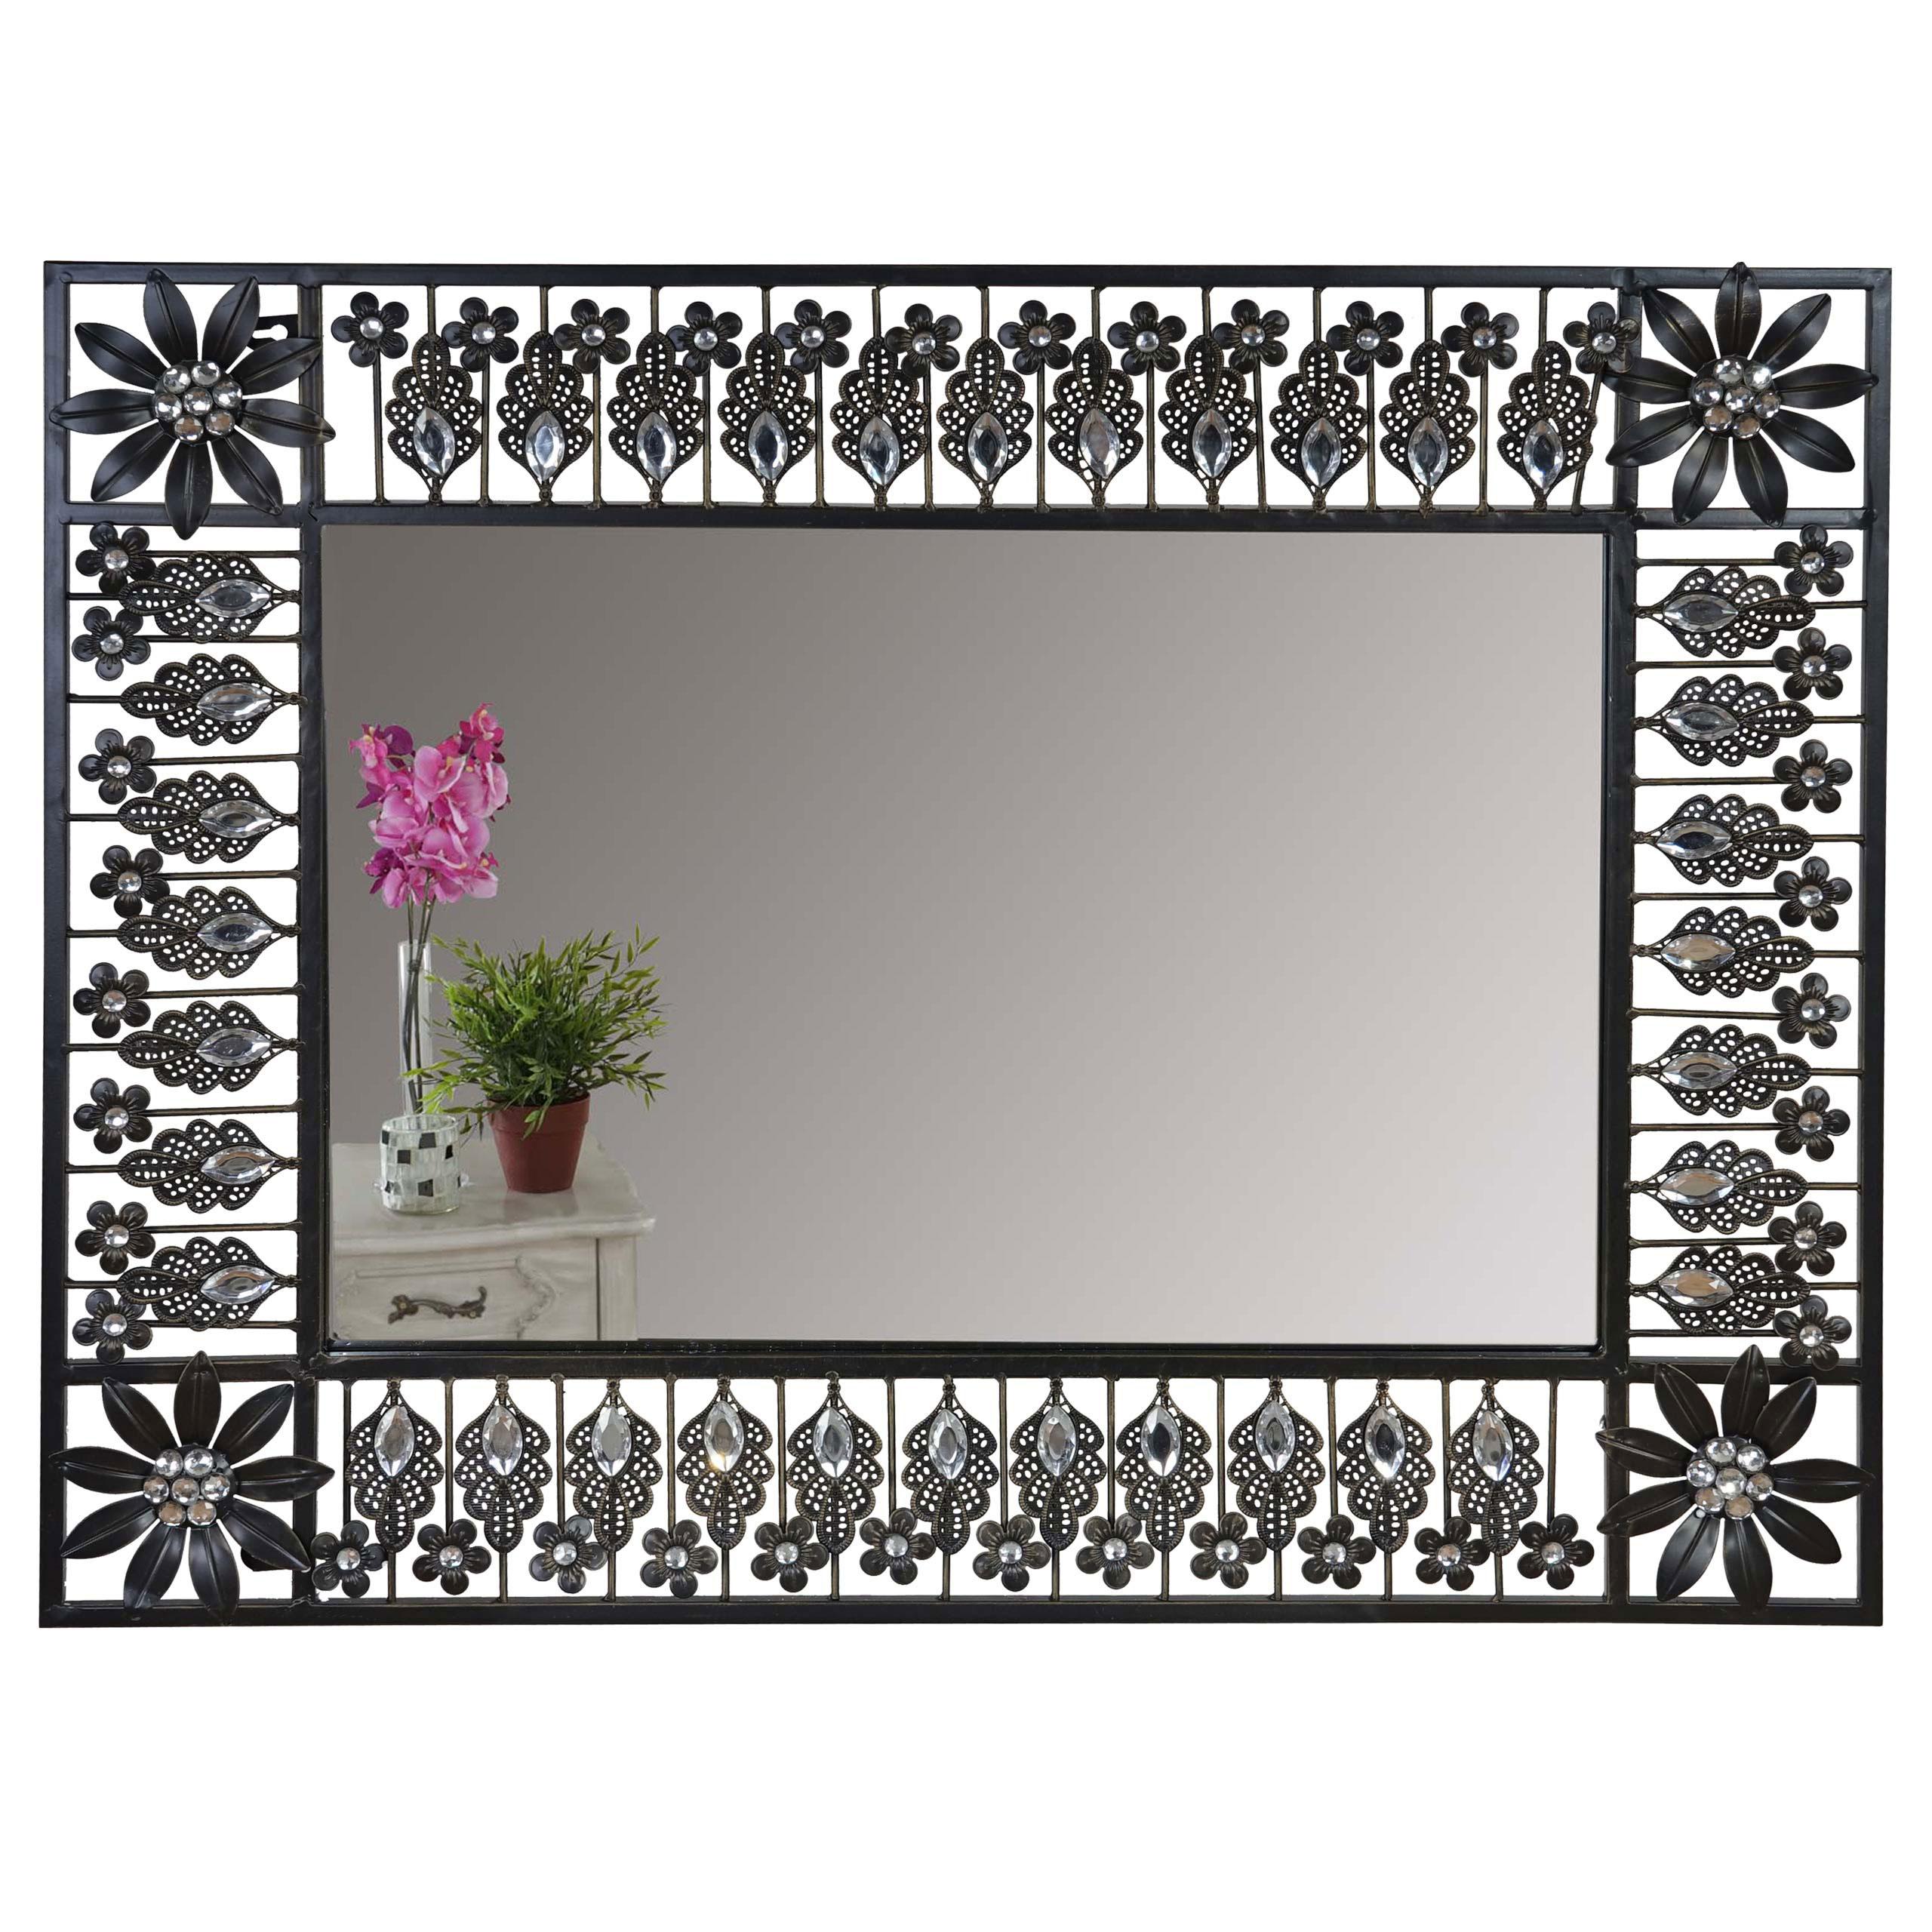 Wandspiegel messina spiegel metall barock antik rund for Spiegel heute